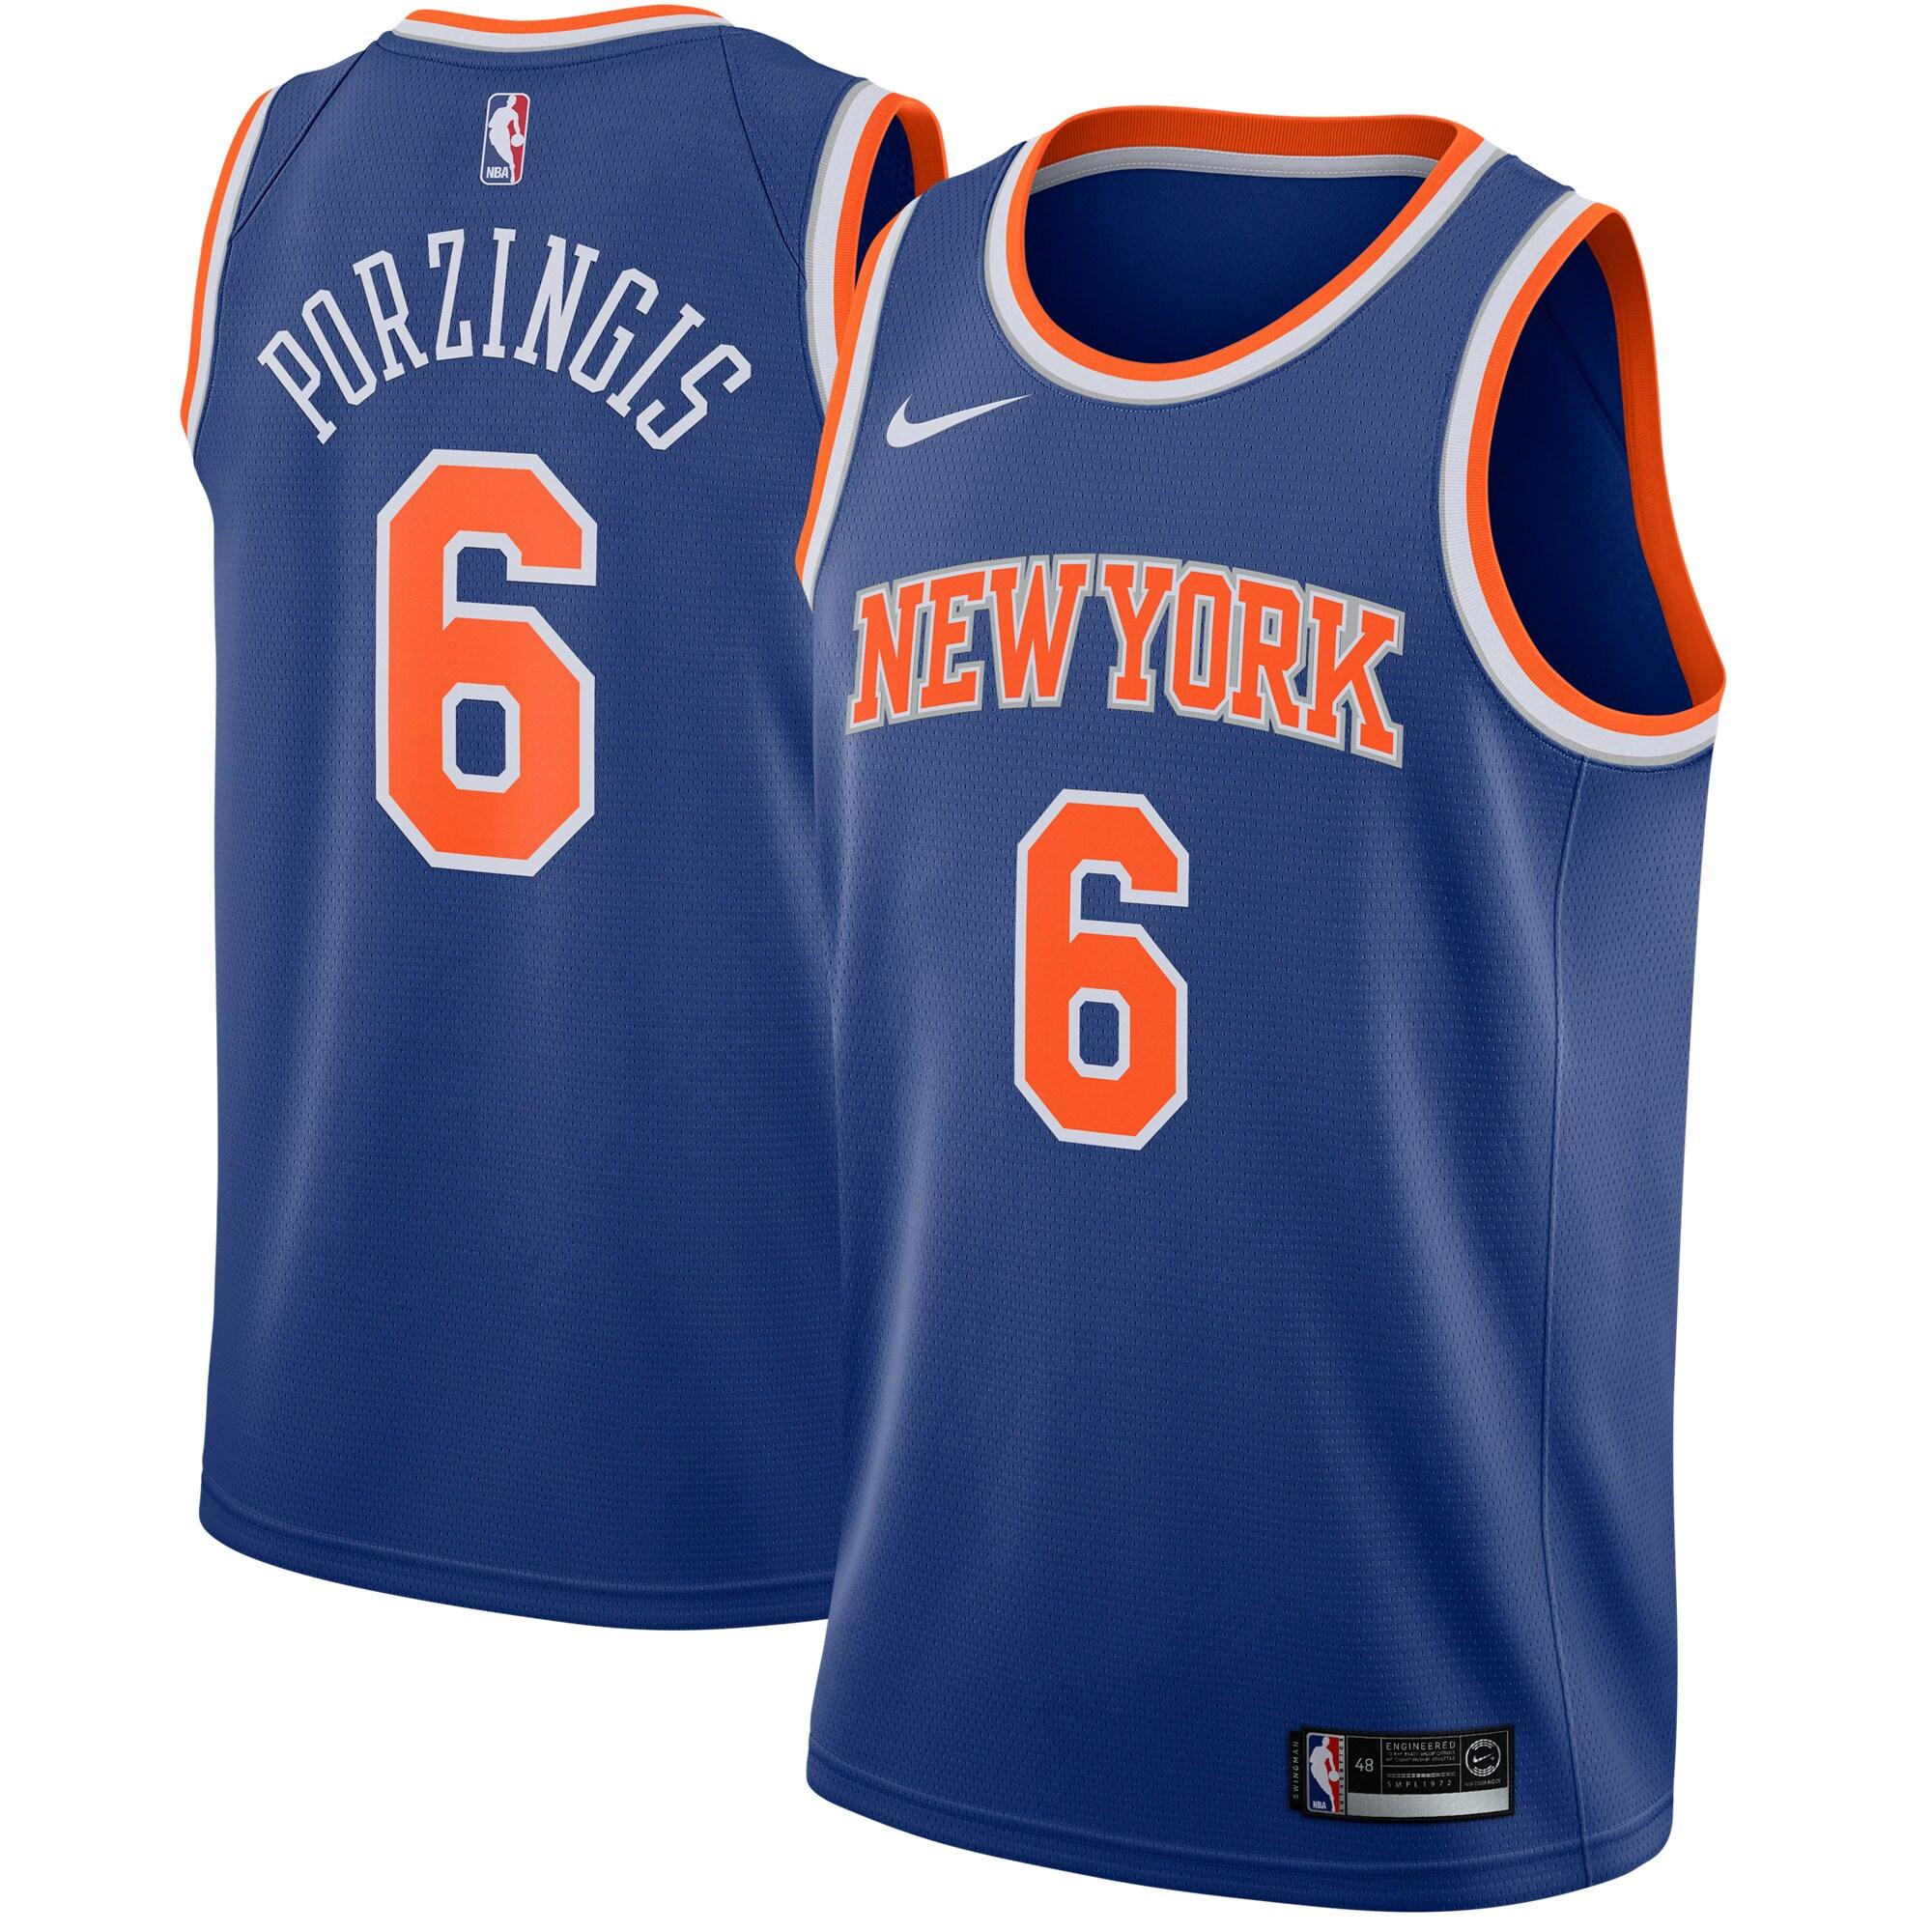 Kristaps Porzingis New York Knicks Nike Swingman Jersey Blue - Icon Edition